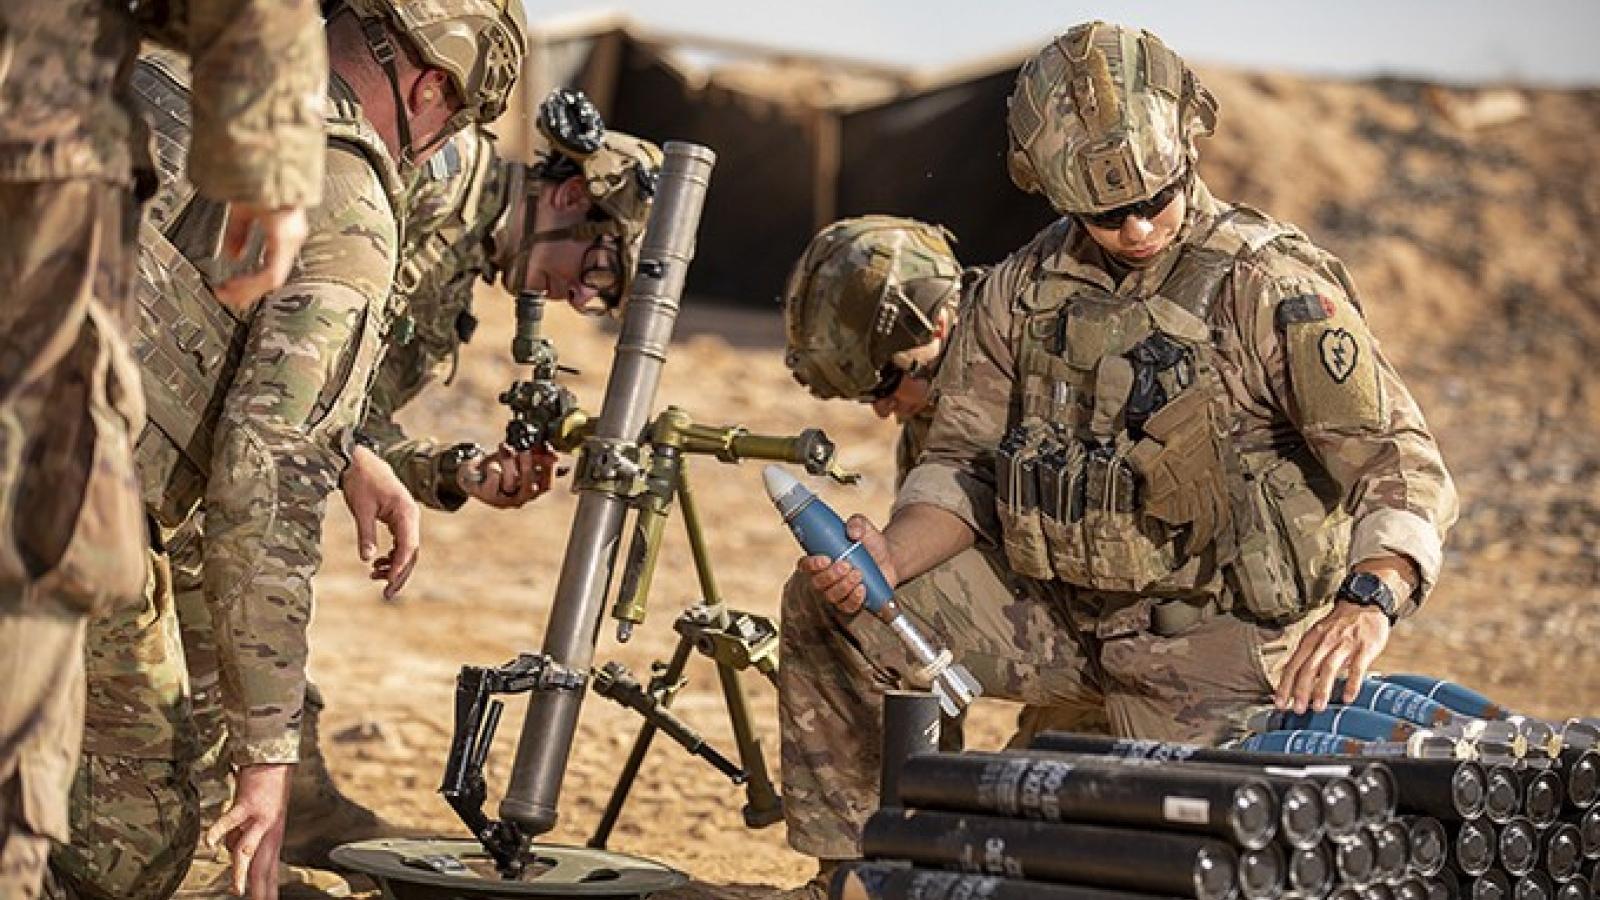 Mỹ tuyên bố rút hầu hết quân đội đồn trú tại Iraq